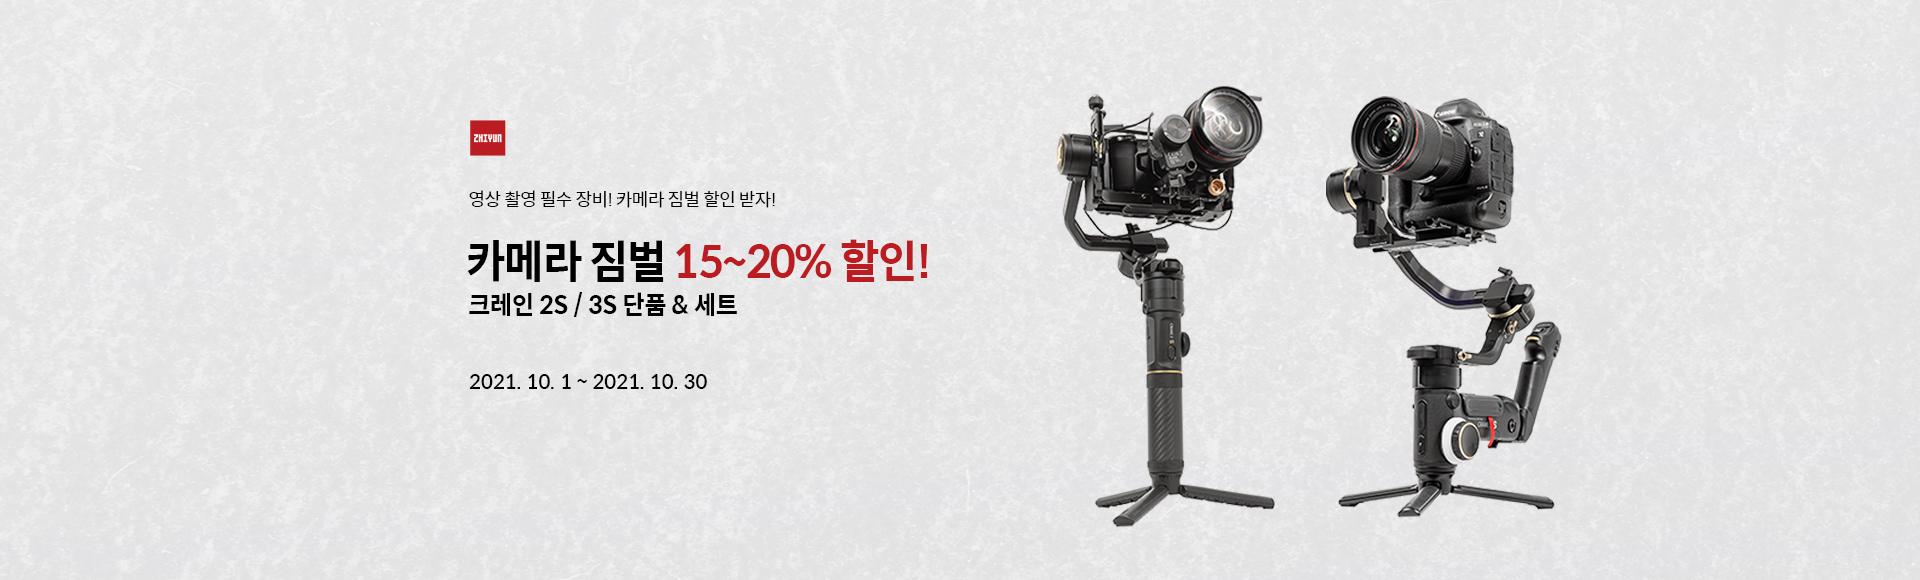 ZHIYUN 카메라짐벌 할인 이벤트